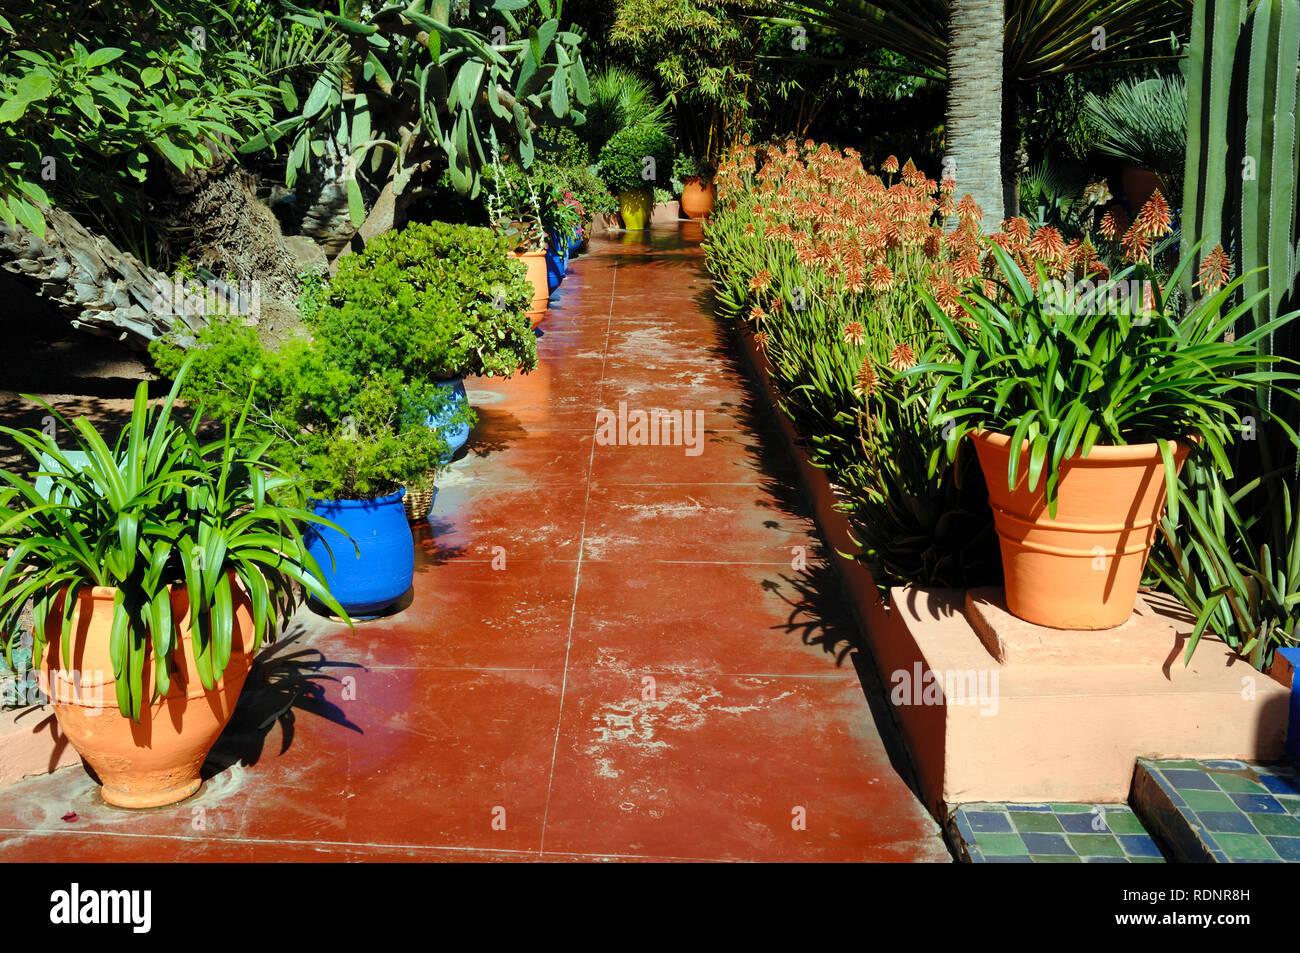 Percorso rosso o Sentiero nel Giardino Majorelle o giardino botanico o di Marrakech Marrakech marocco Foto Stock